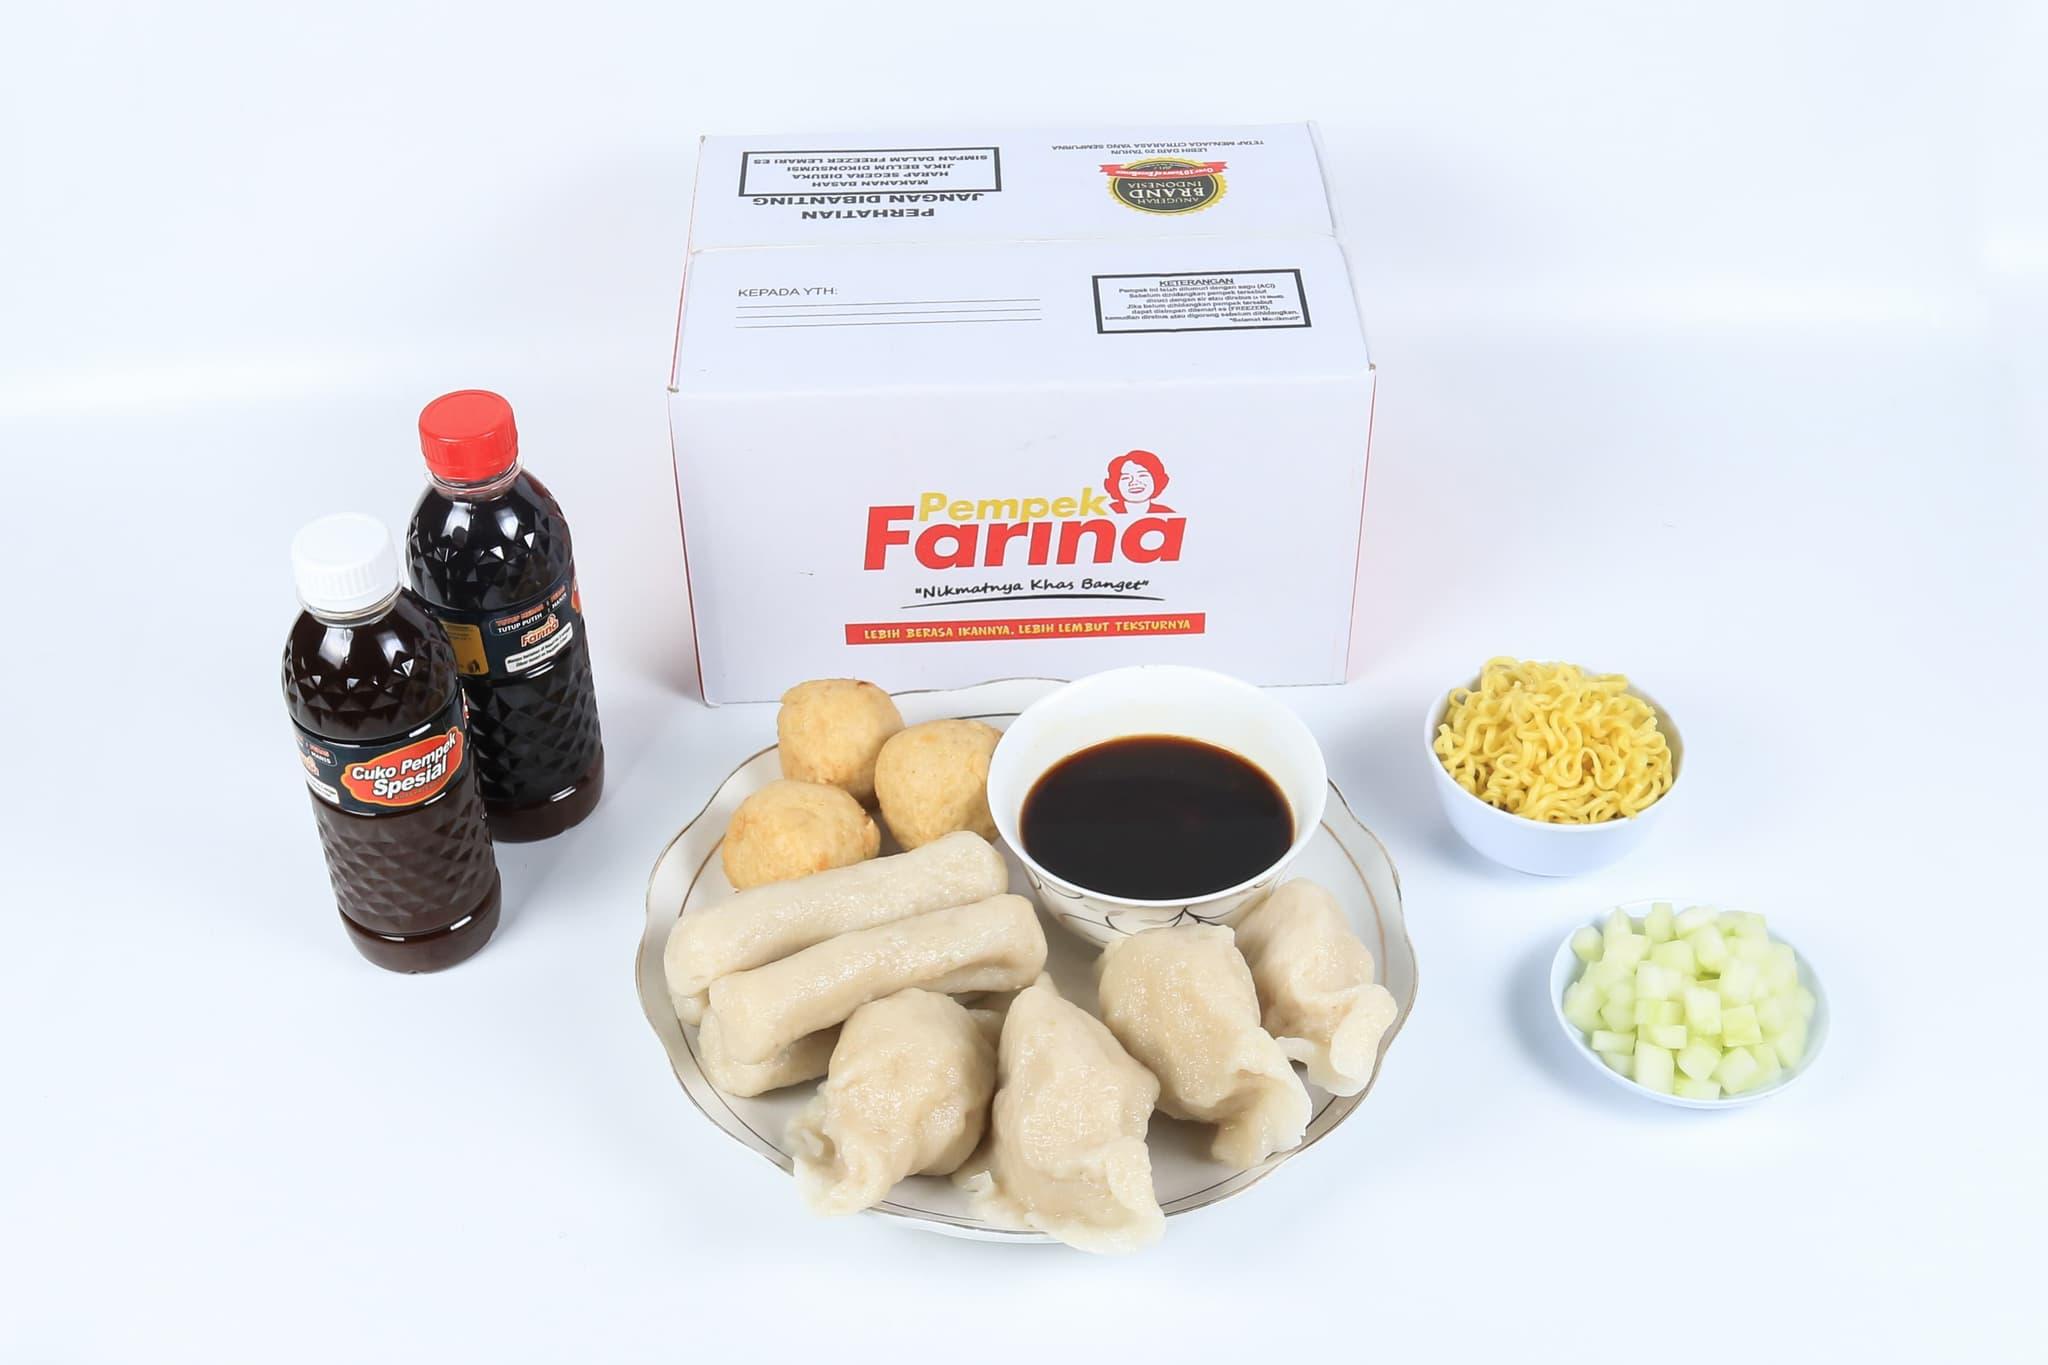 Pempek Farina Paket B3 - Blanja.com